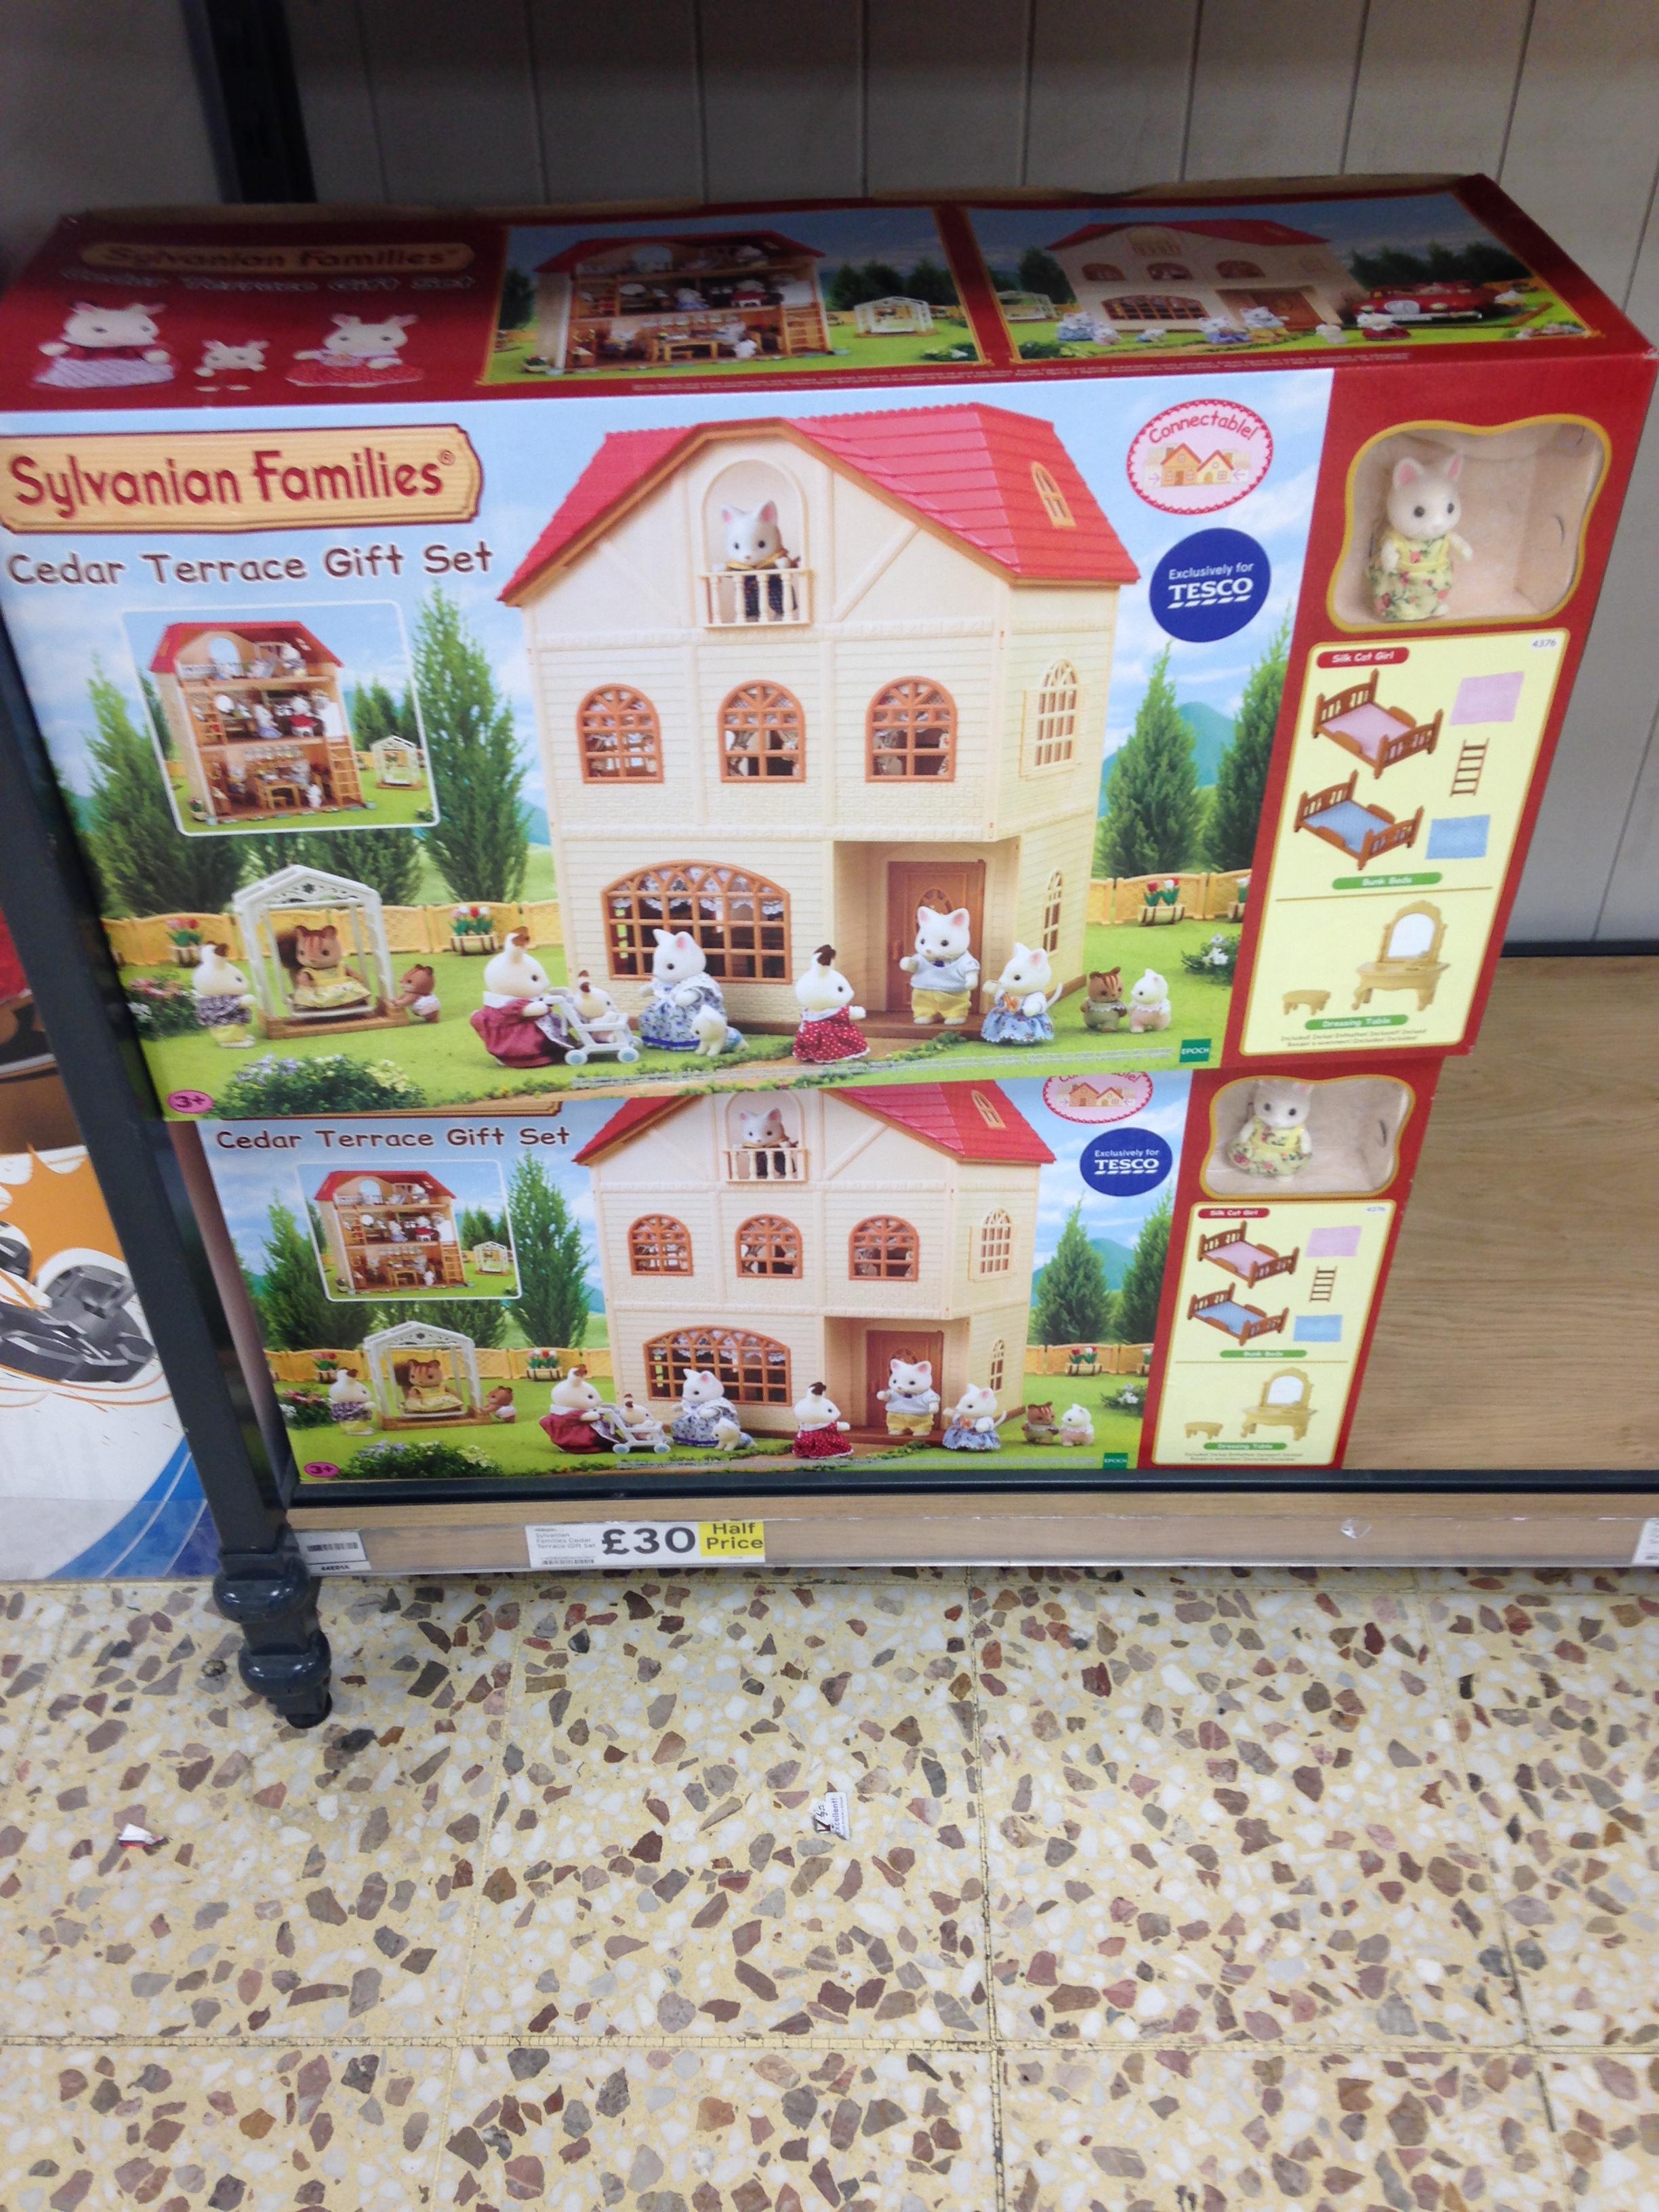 Sylvanian families cedar terrace gift set £30 instore Tesco extra